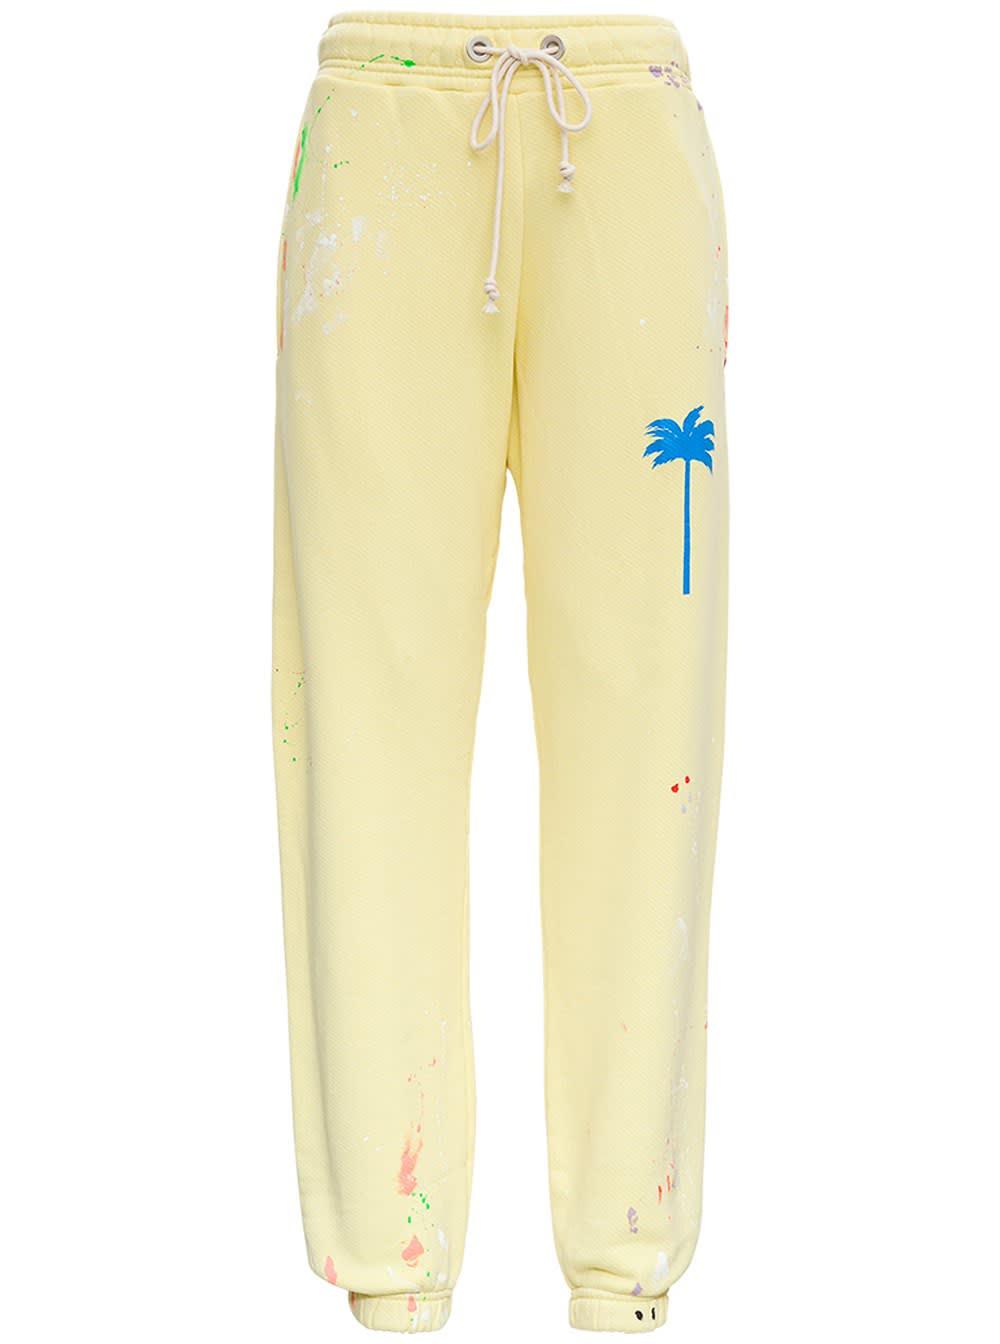 Palm Angels Pants PXP YELLOW COTTON JOGGER